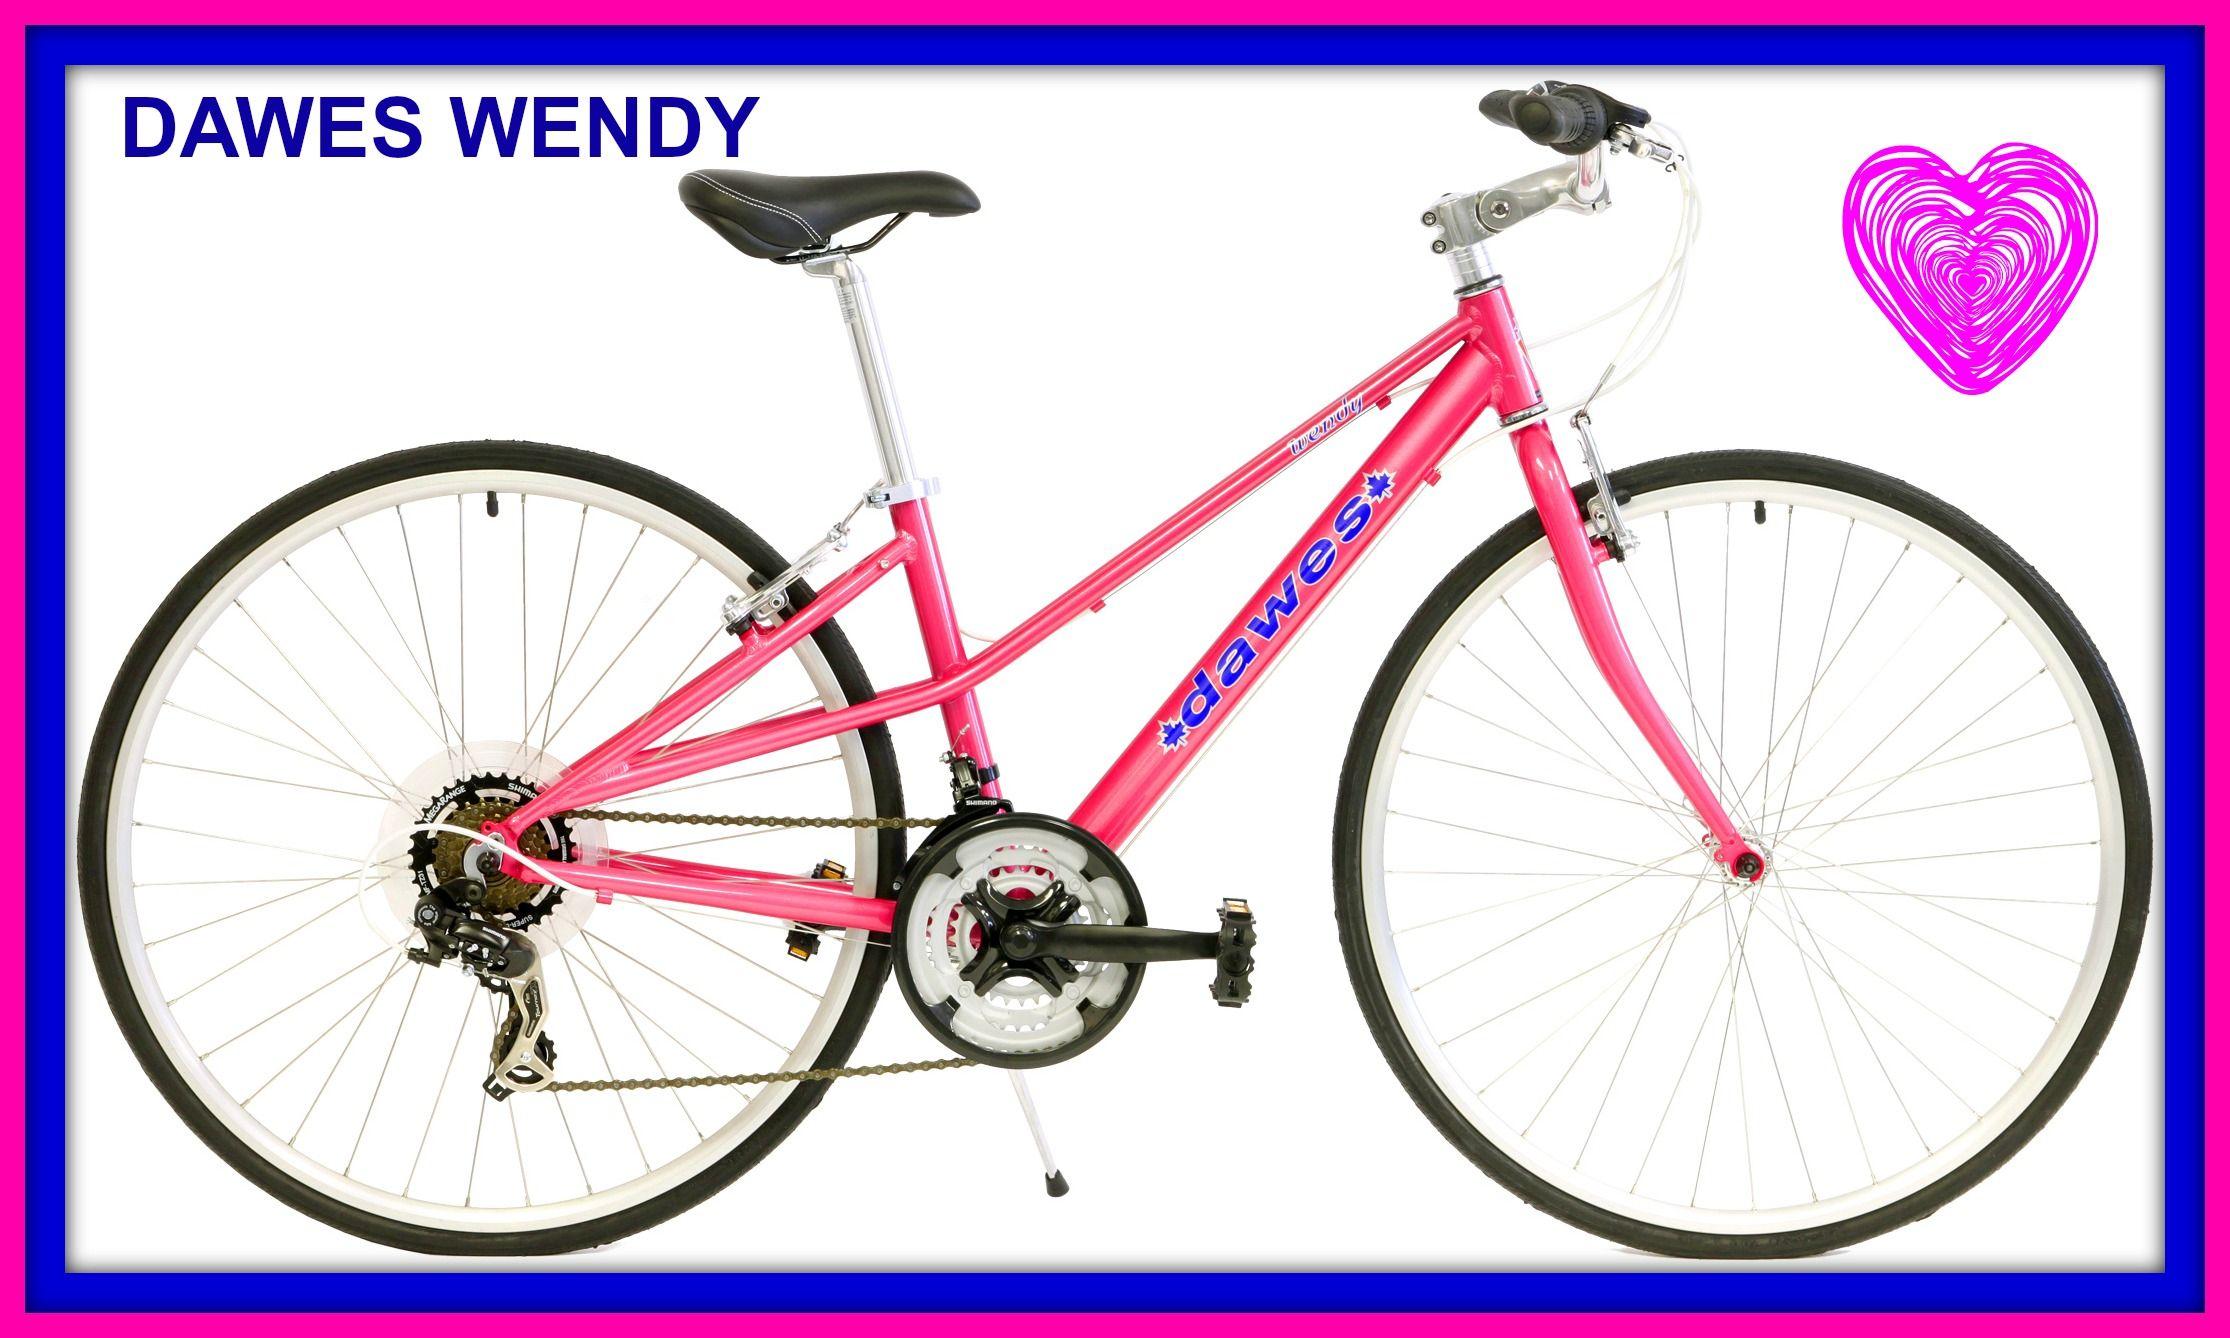 Dawes Wendy Aluminum Road Bike Comfort Bicycle Road Bikes Bicycle